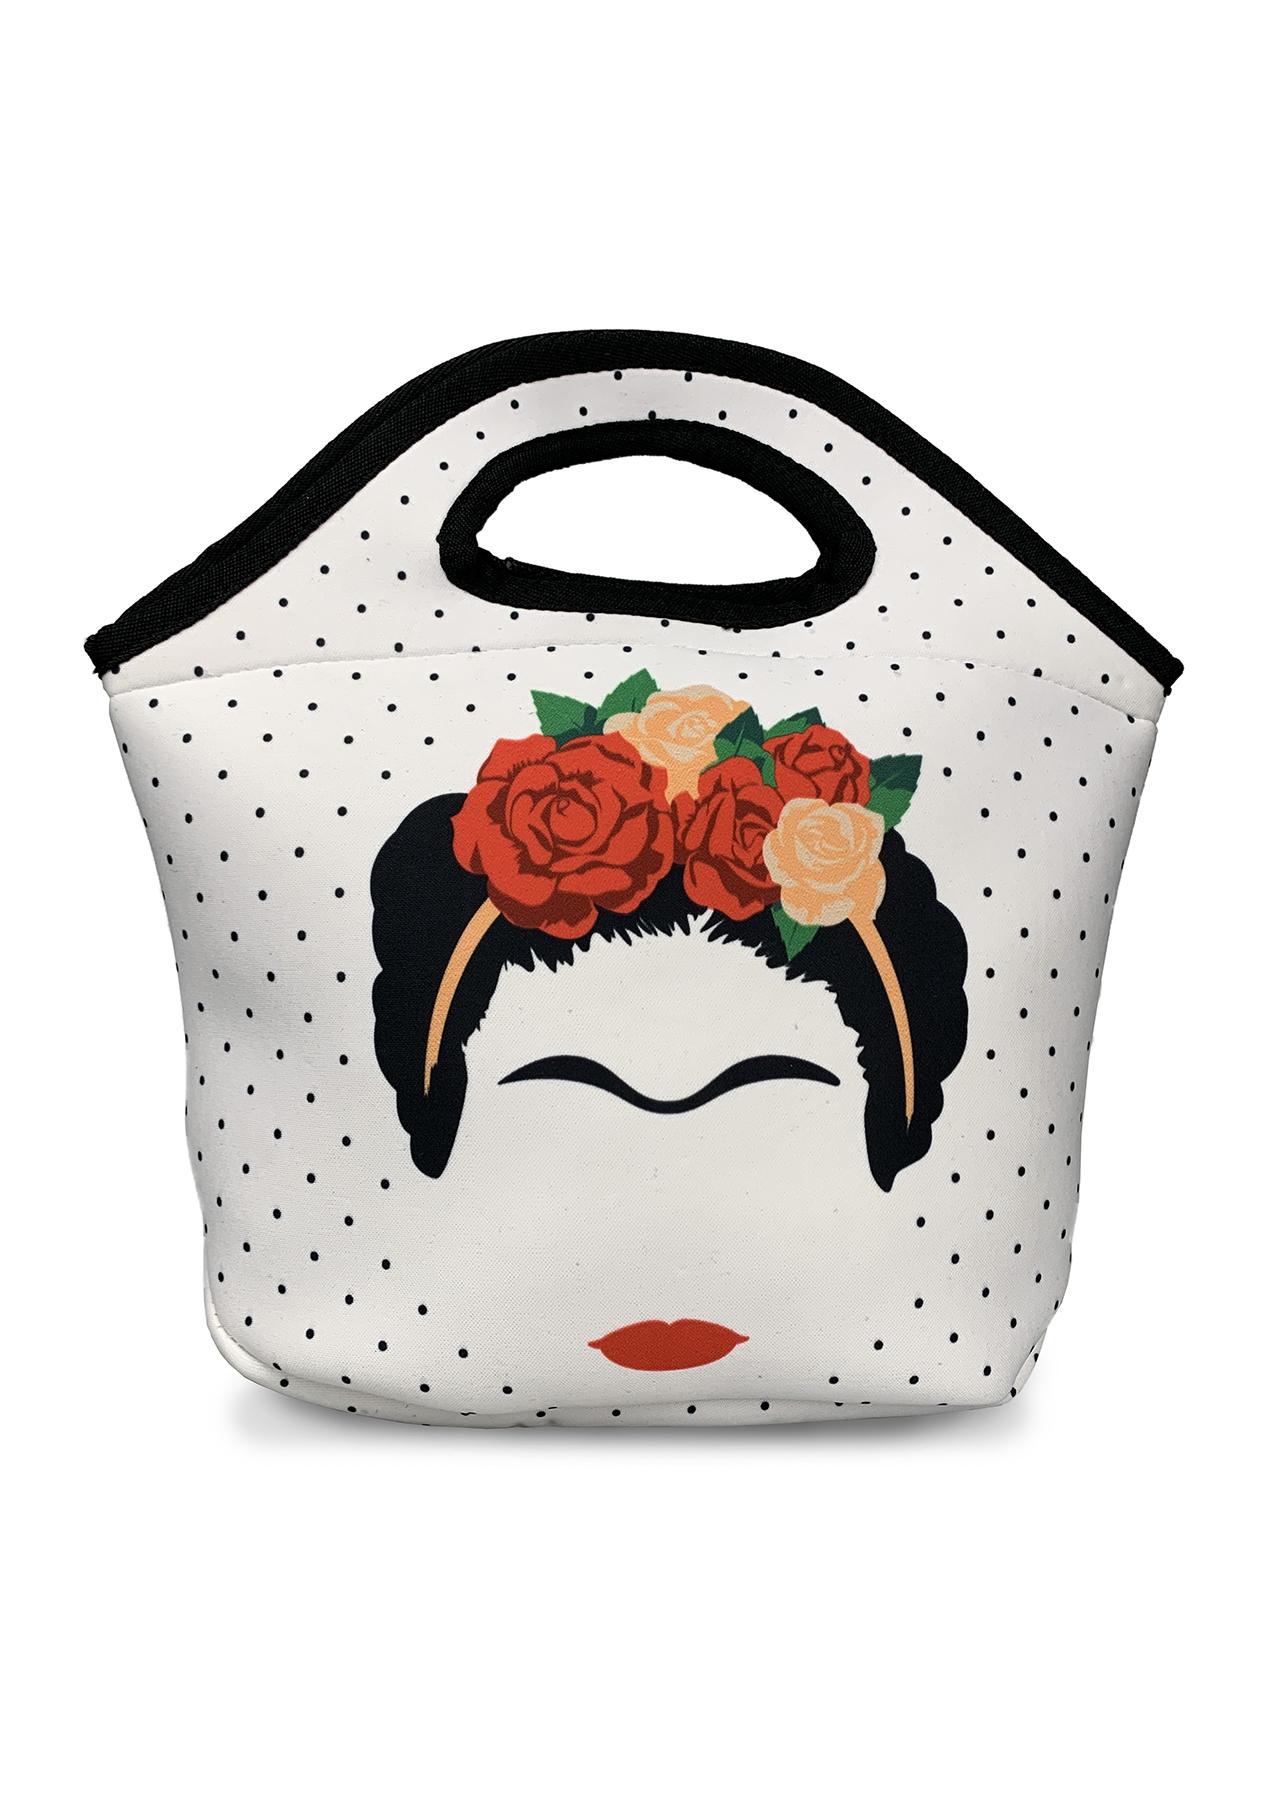 Frida Kahlo Minimalist Neoprene Lunch Bag